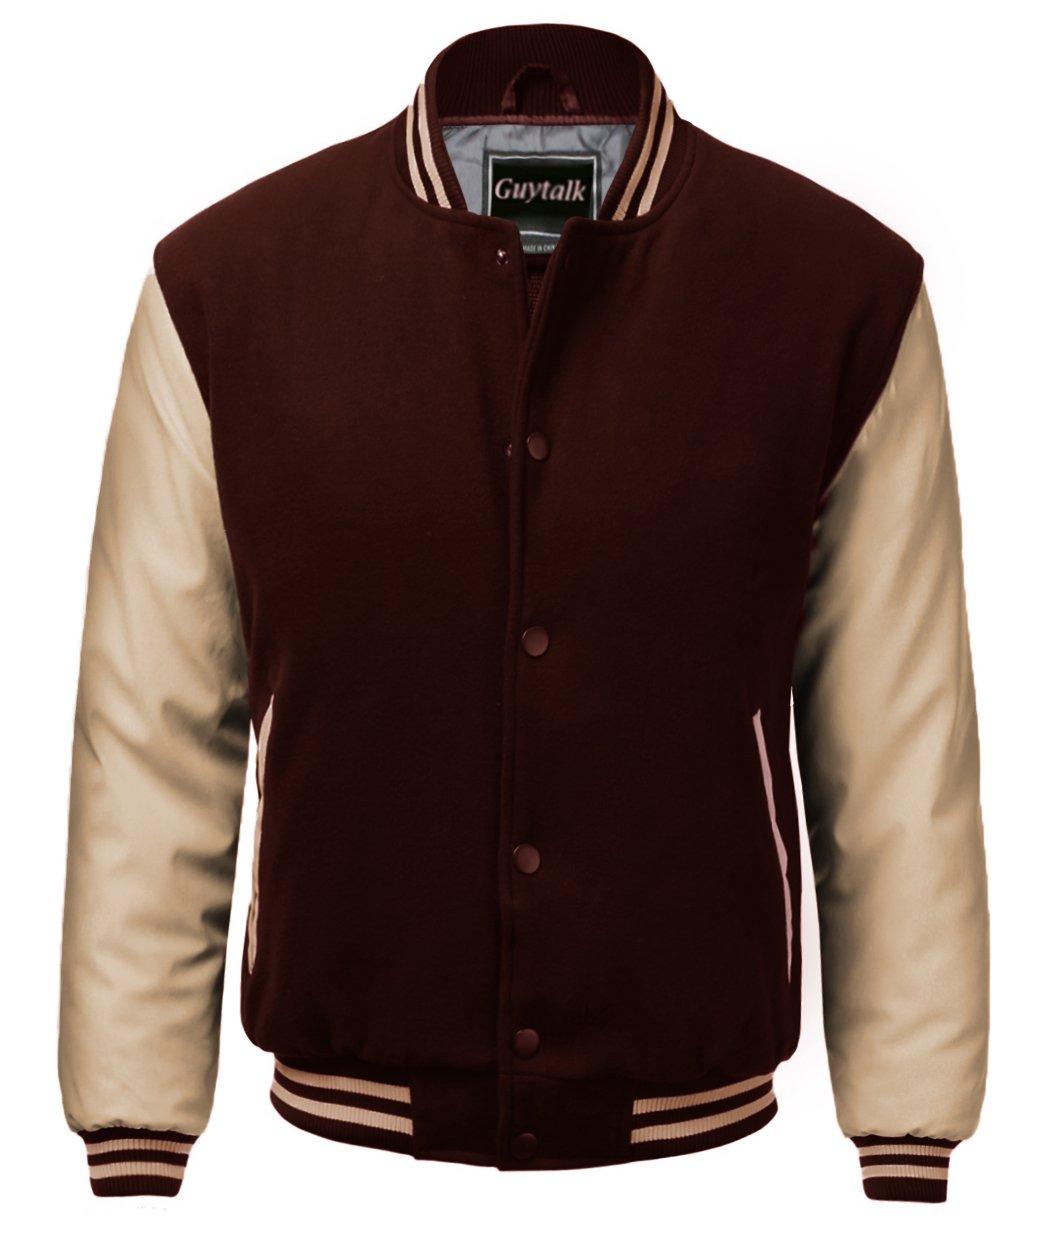 Guytalk Men's Letterman Style Premium Thick Fabric Varsity Baseball Jacket Medium BROWNKHAKI